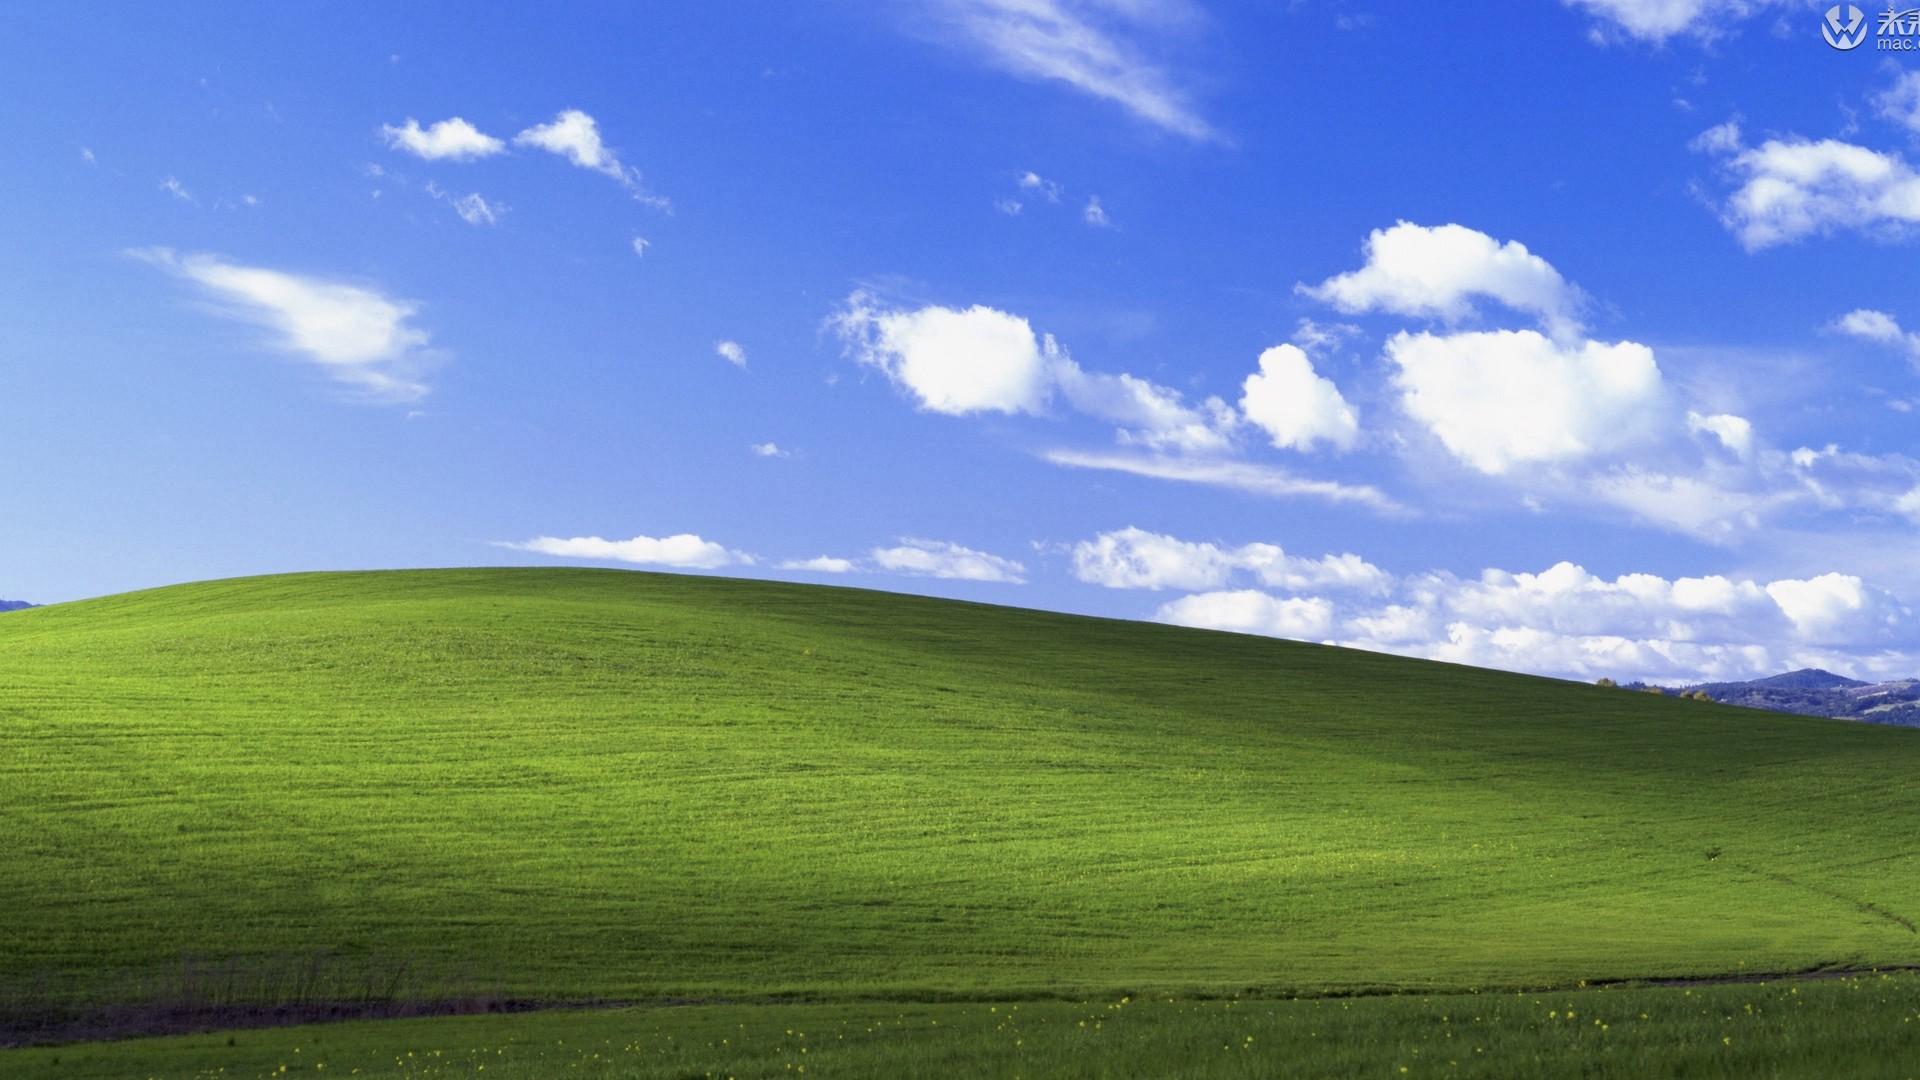 windows xp经典苹果电脑桌面壁纸